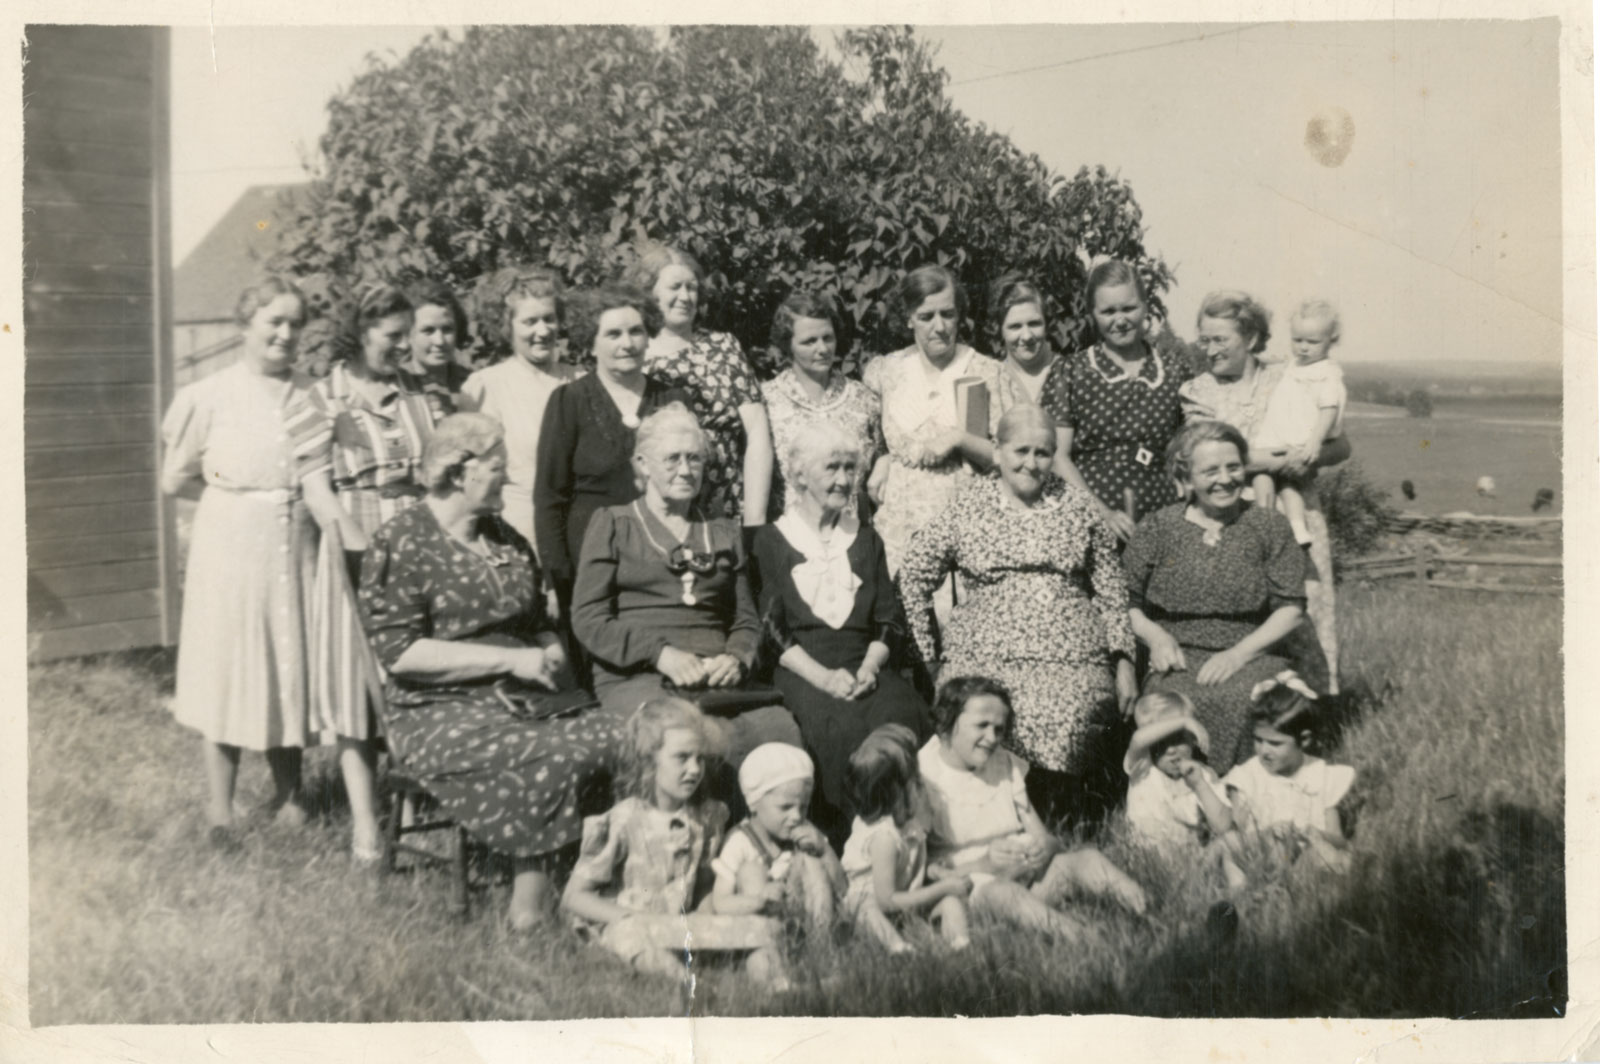 Women's Church Group, Iron Bridge, Circa 1940